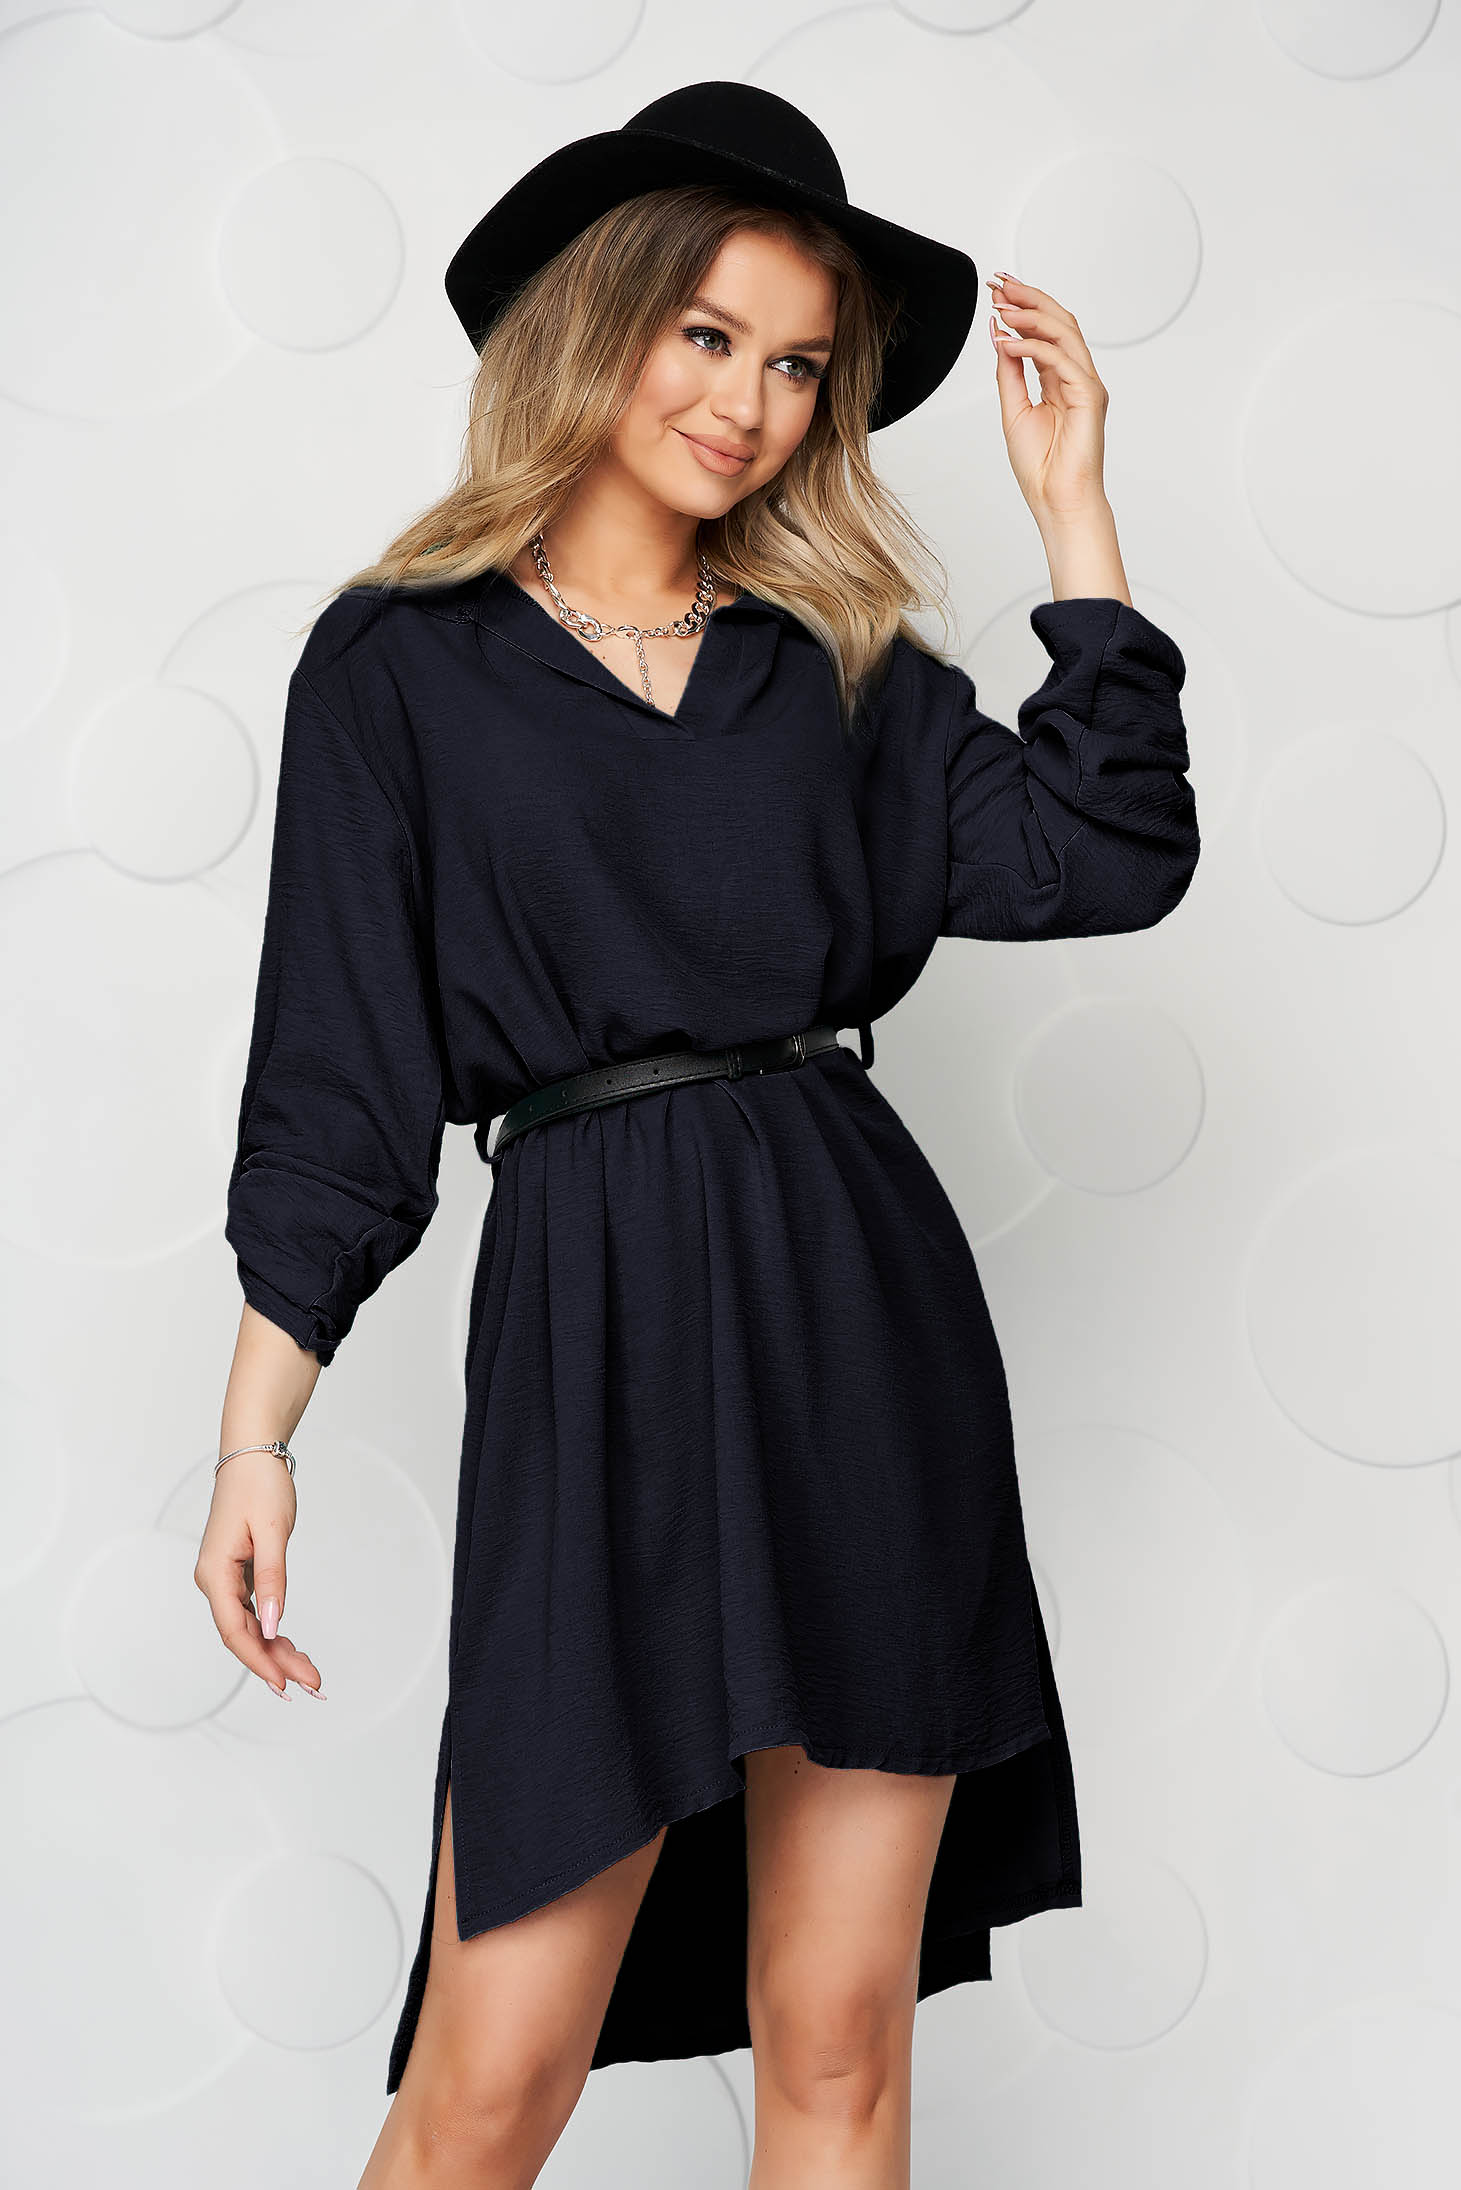 Shirt dress darkblue short cut straight dress thin fabric